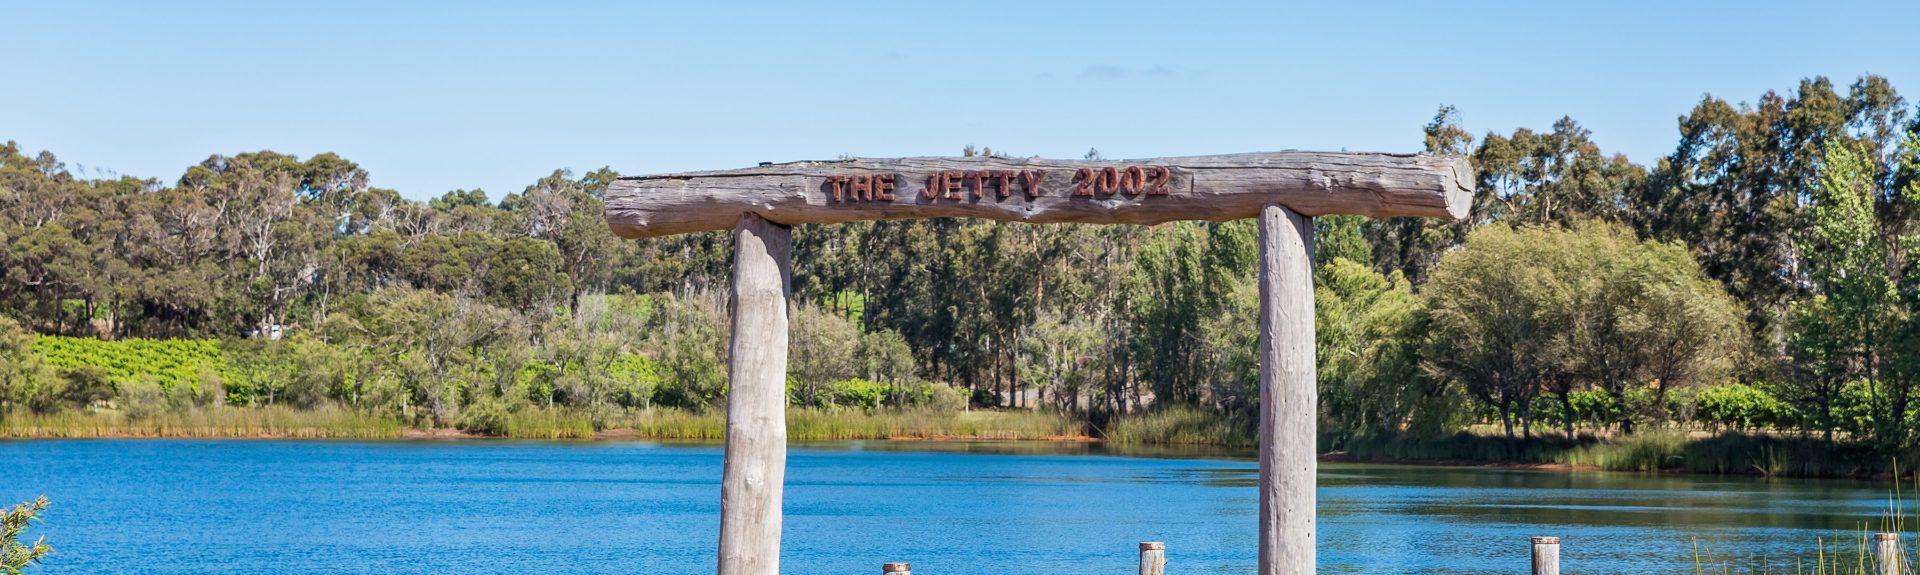 Treeton, Western Australia, Australia